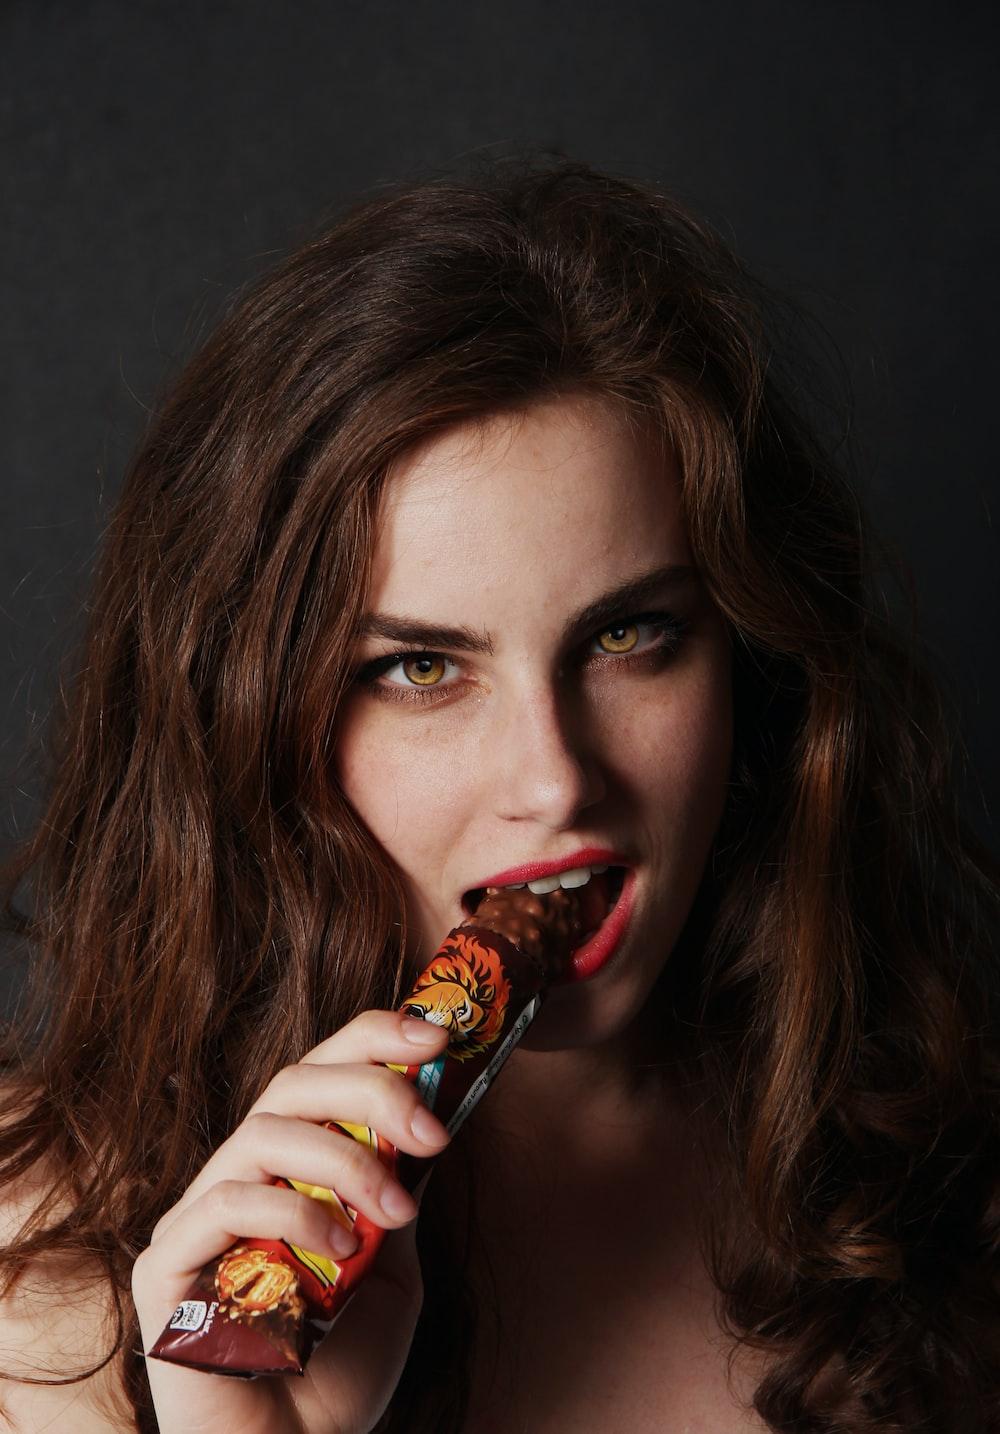 woman biting on chocolate bar